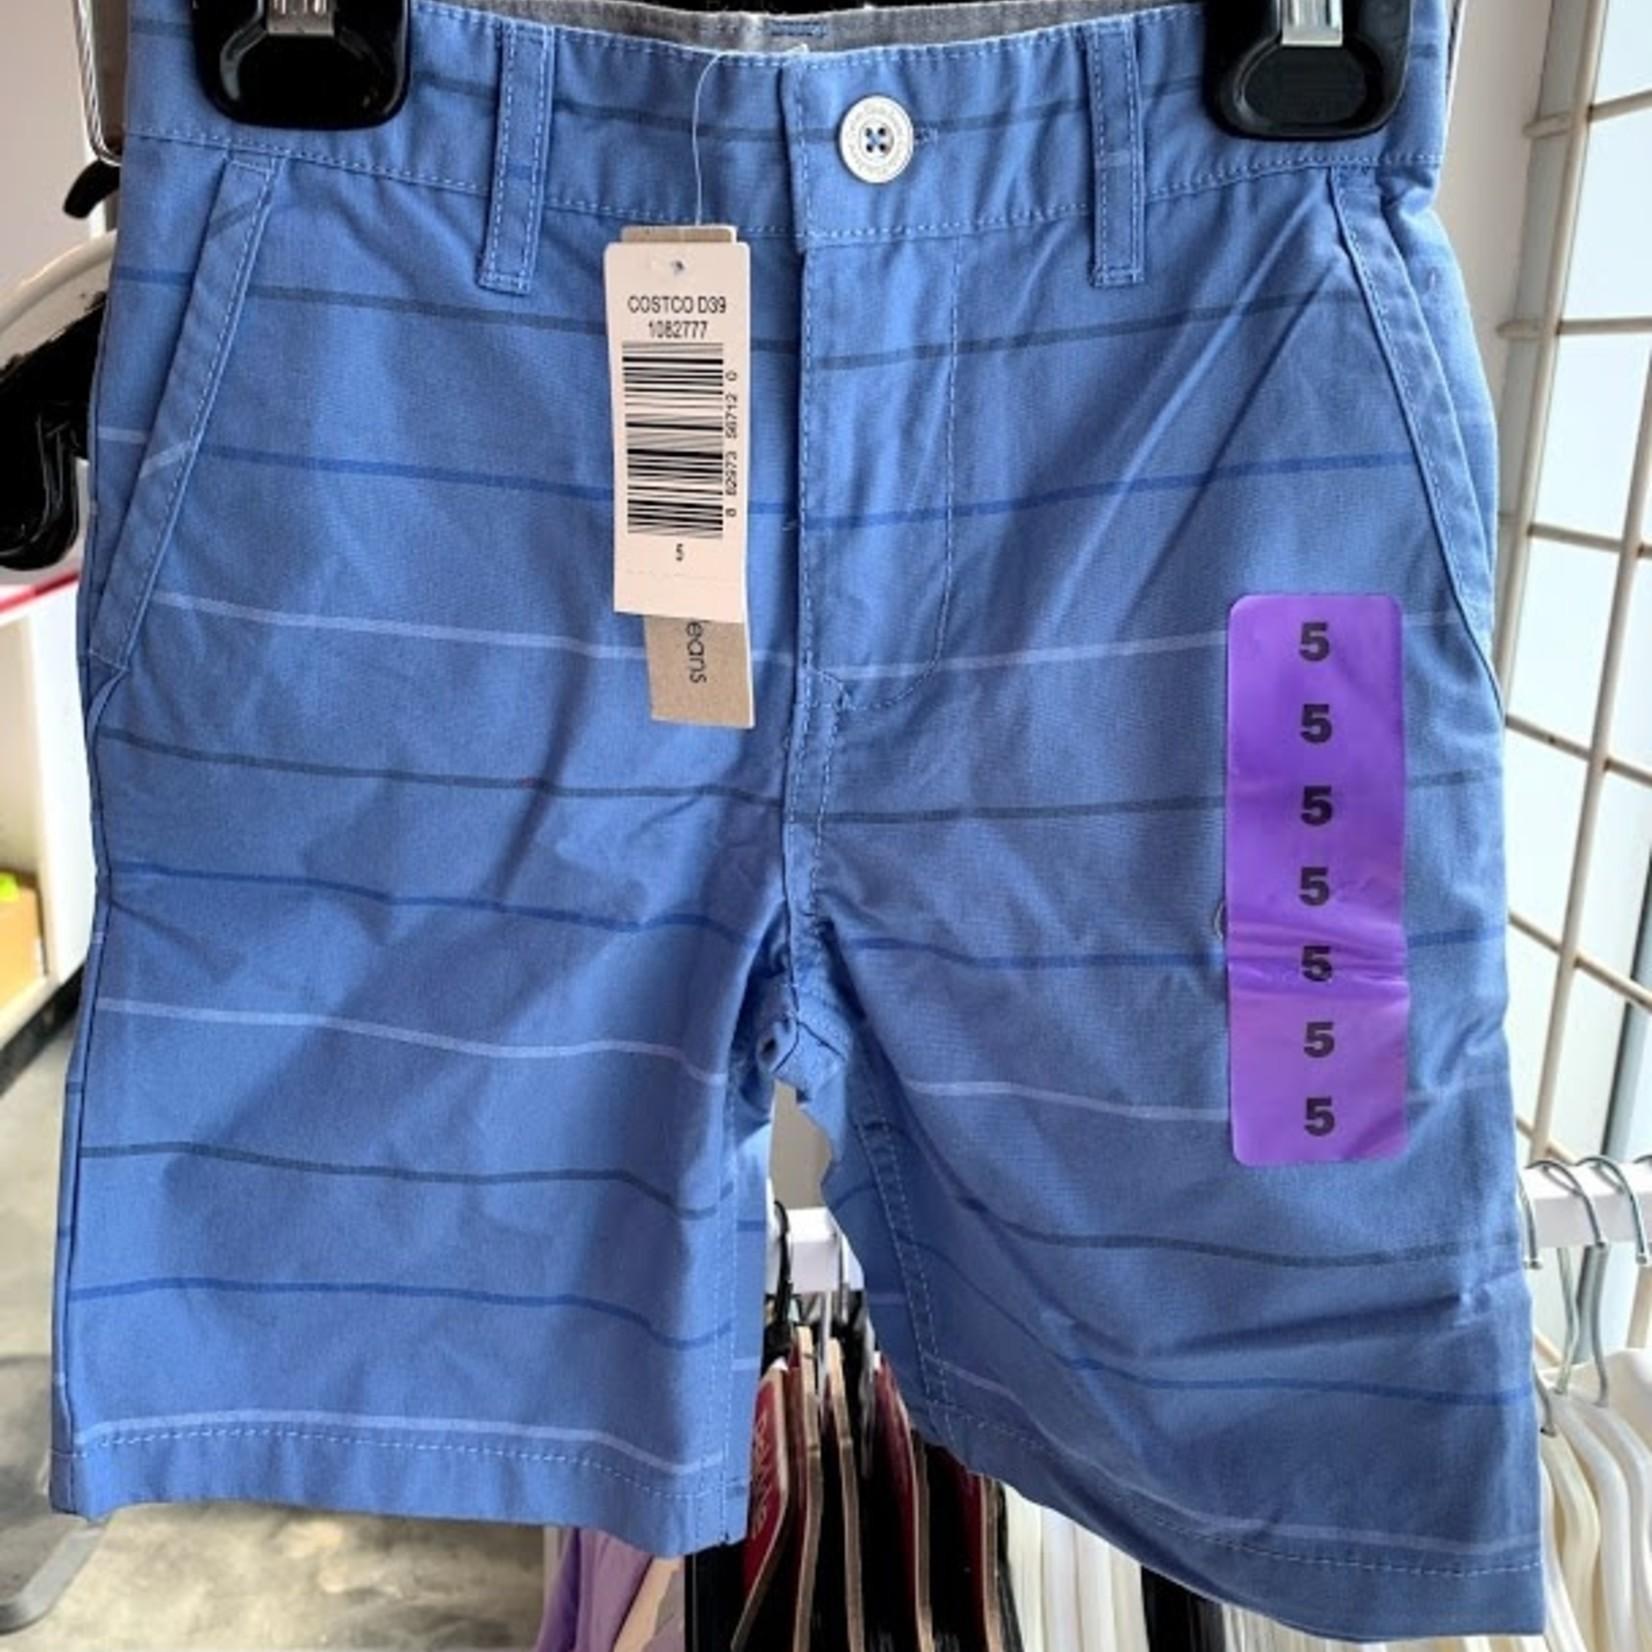 Calvin Klein Boys Walk Shorts - Blue/Strip Size 12